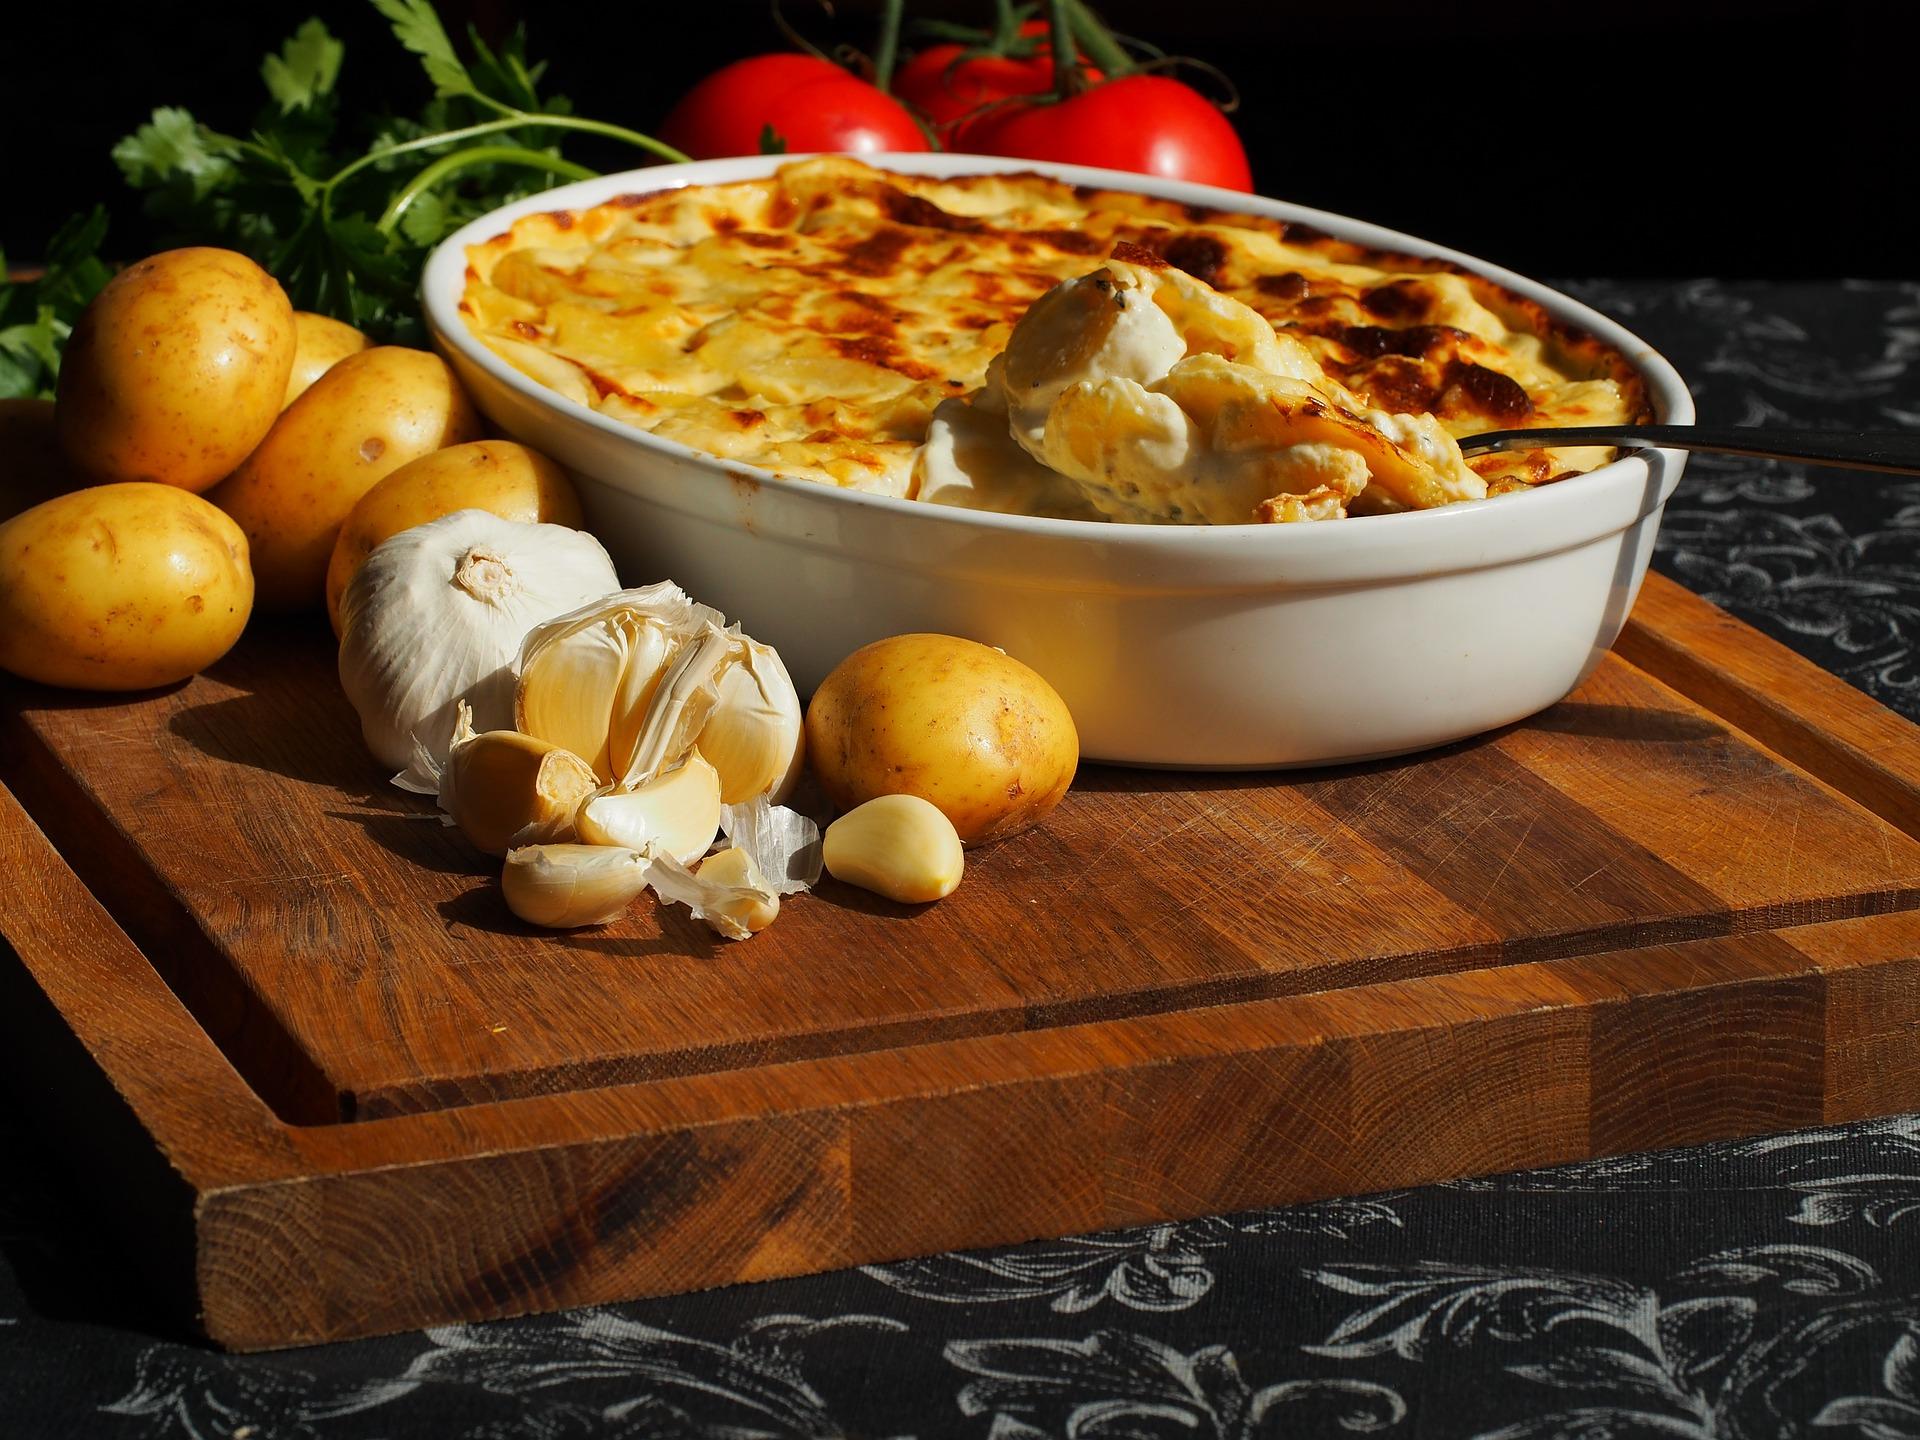 Gateau di patate: ricetta semplice e veloce